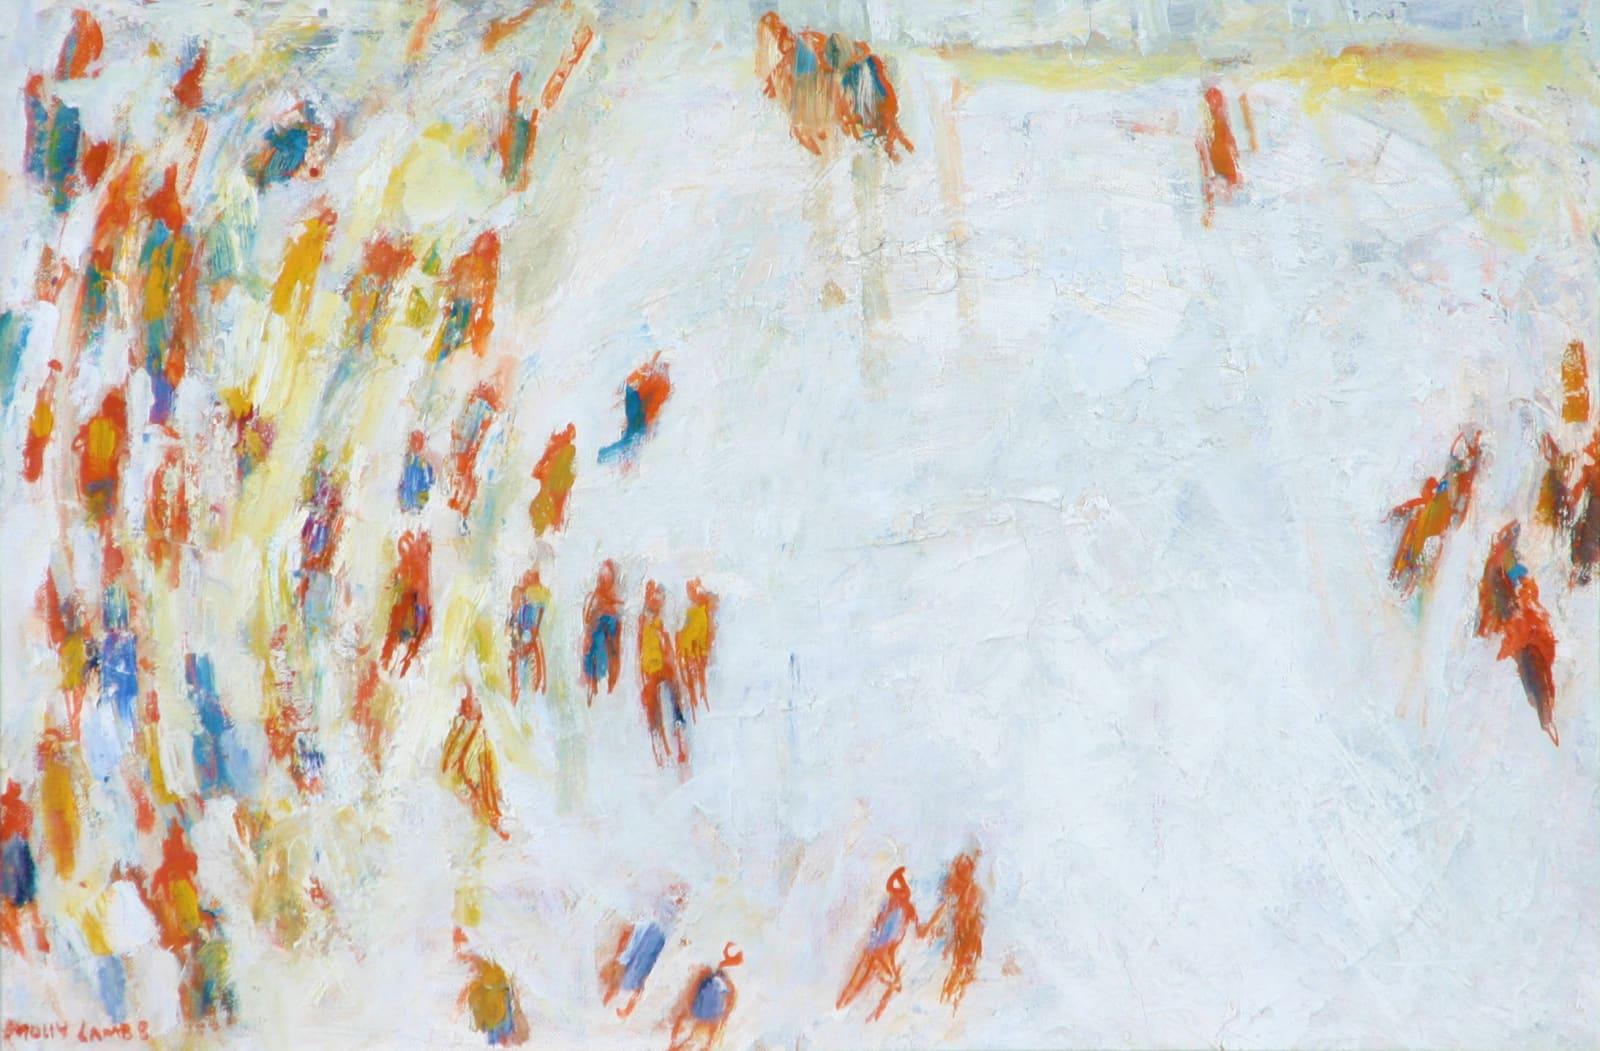 Molly Lamb Bobak, The Skaters, 1964